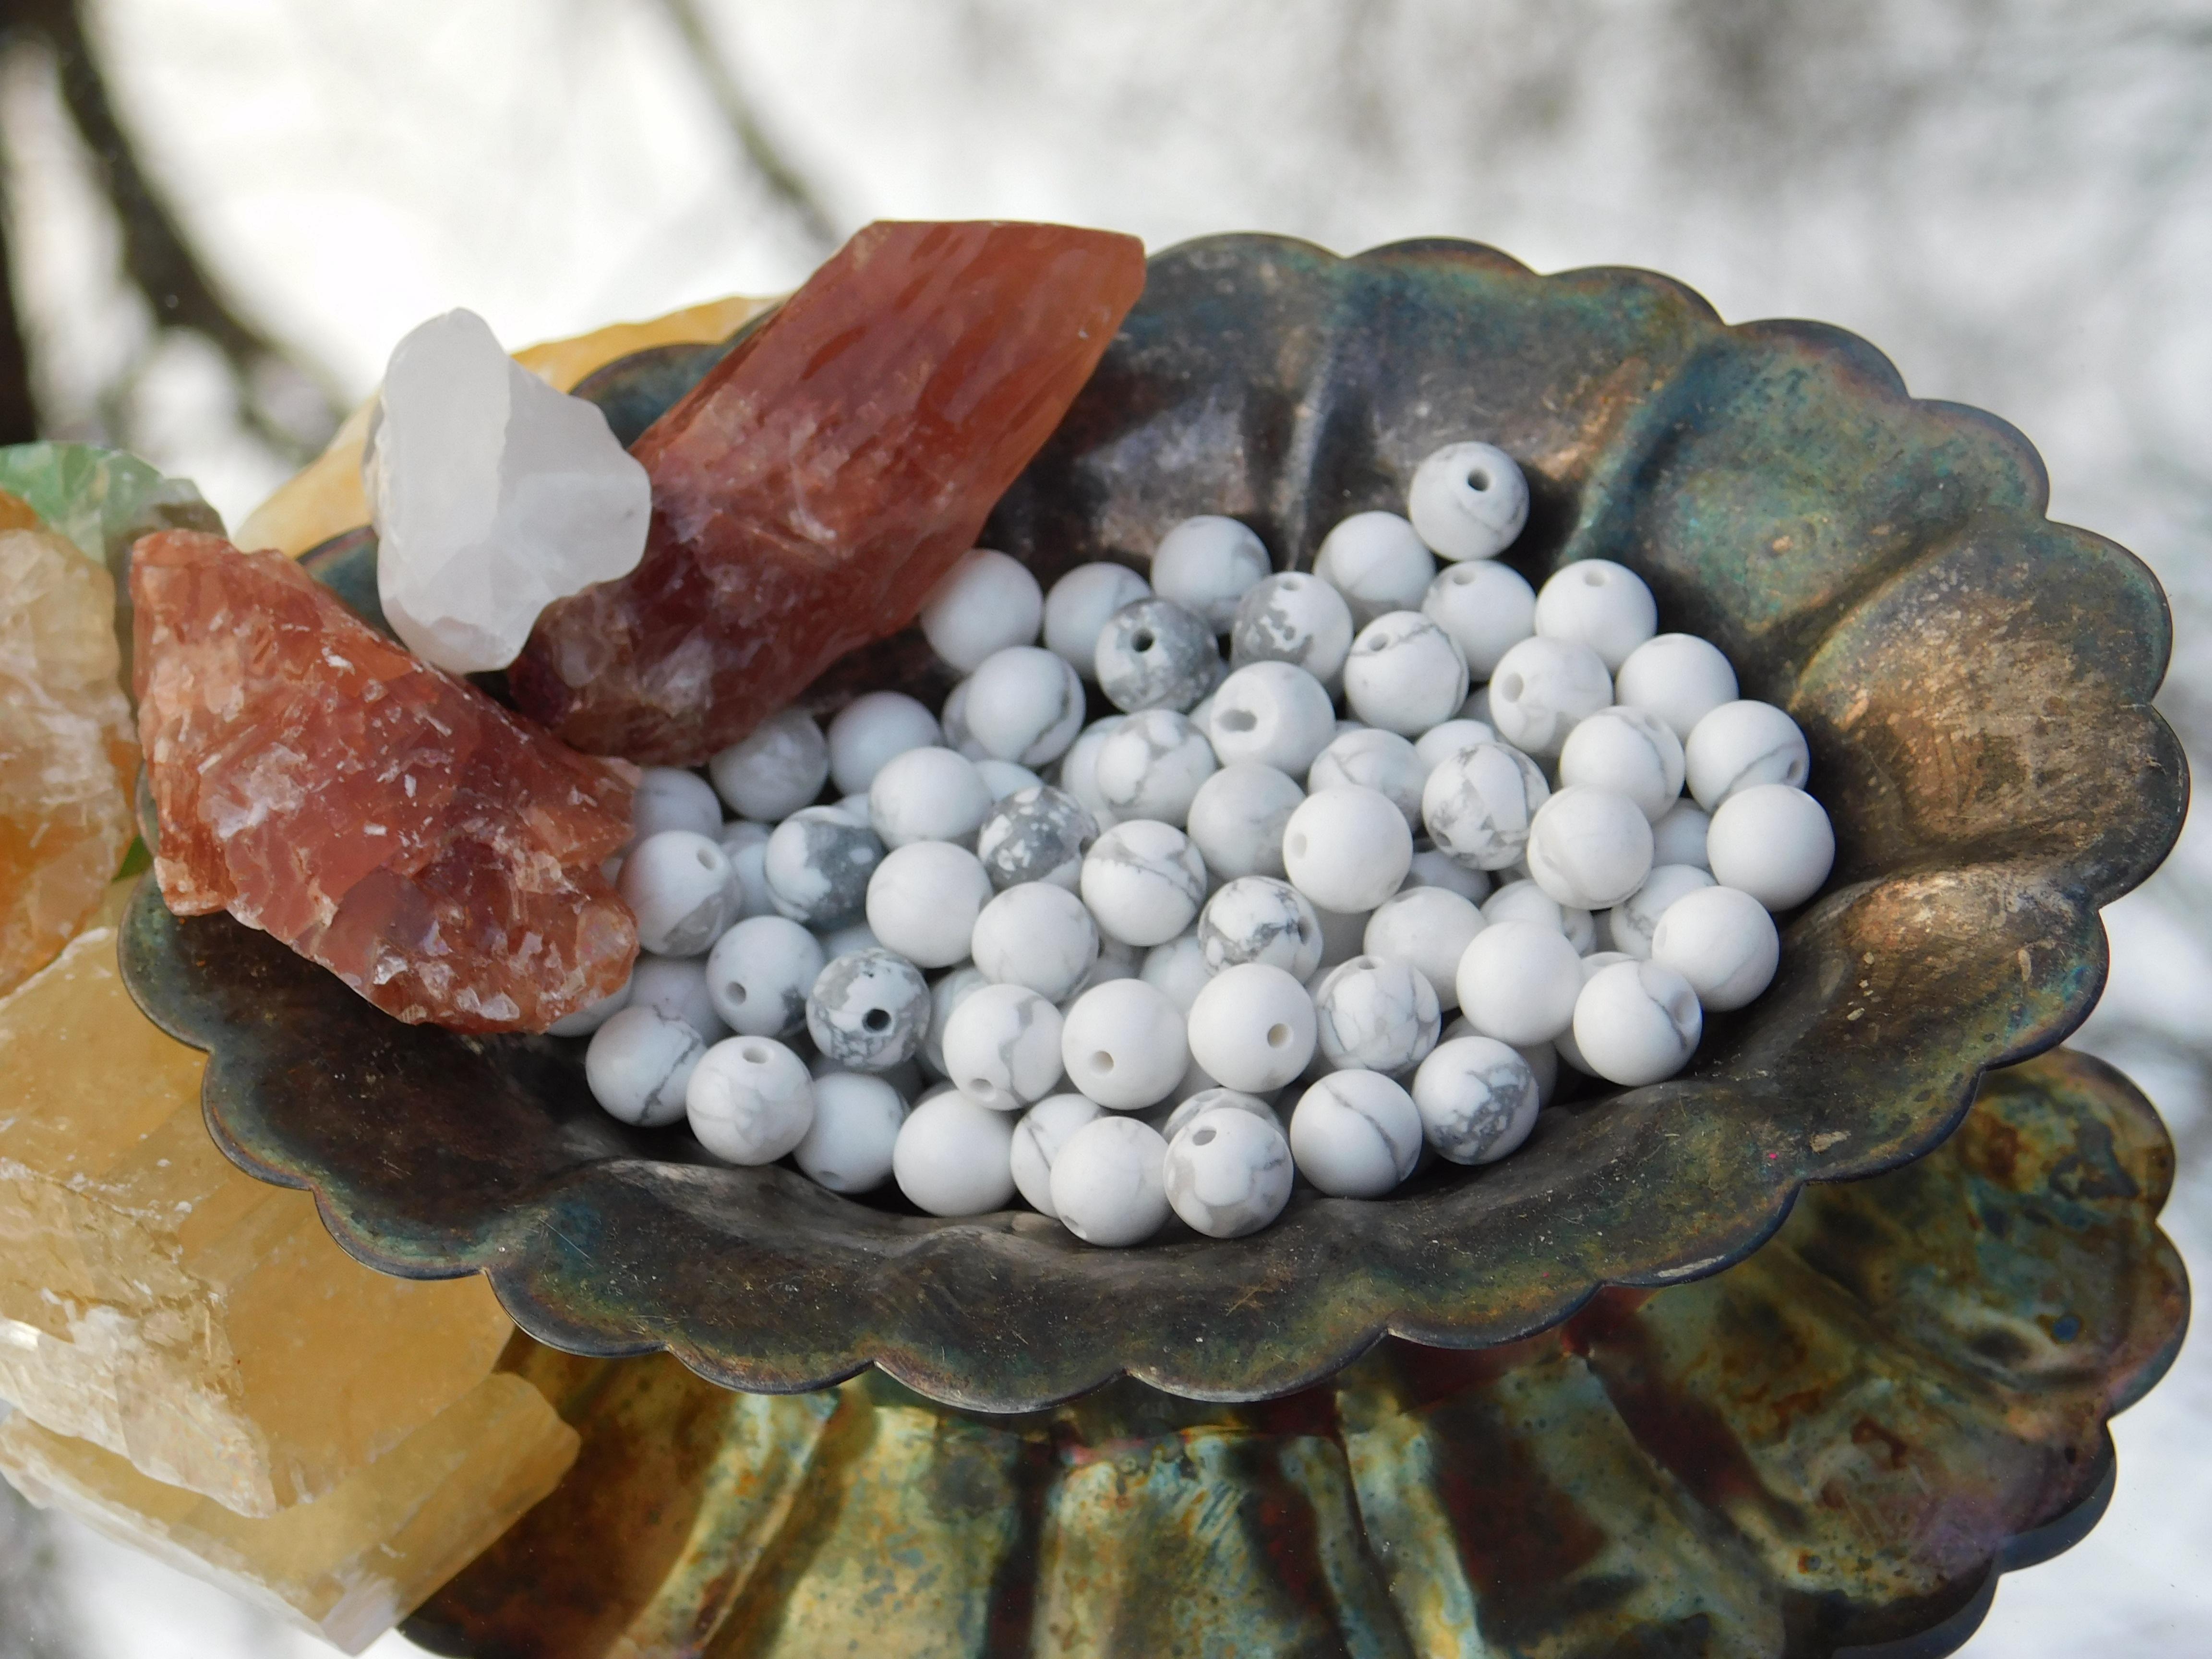 Fotos gratis rock comida guijarro material joyer a for Piedra preciosa turquesa